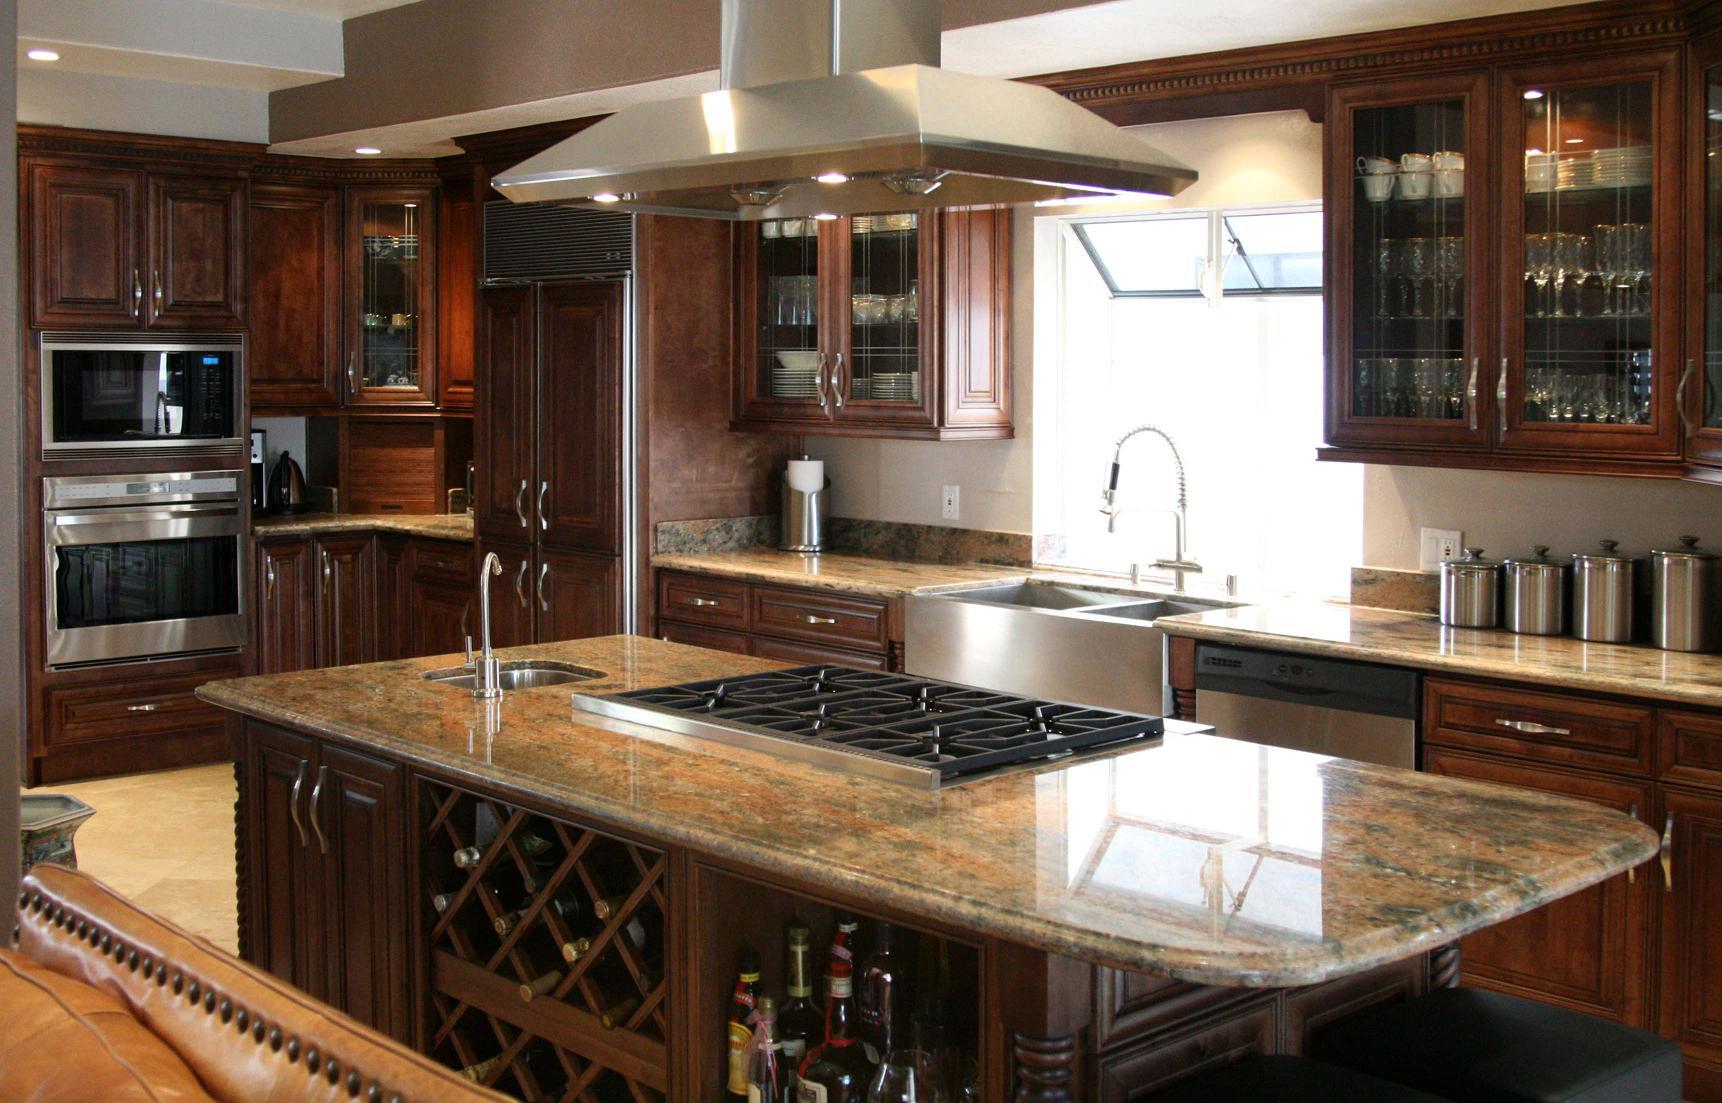 Kitchen island with wine storage photo - 3